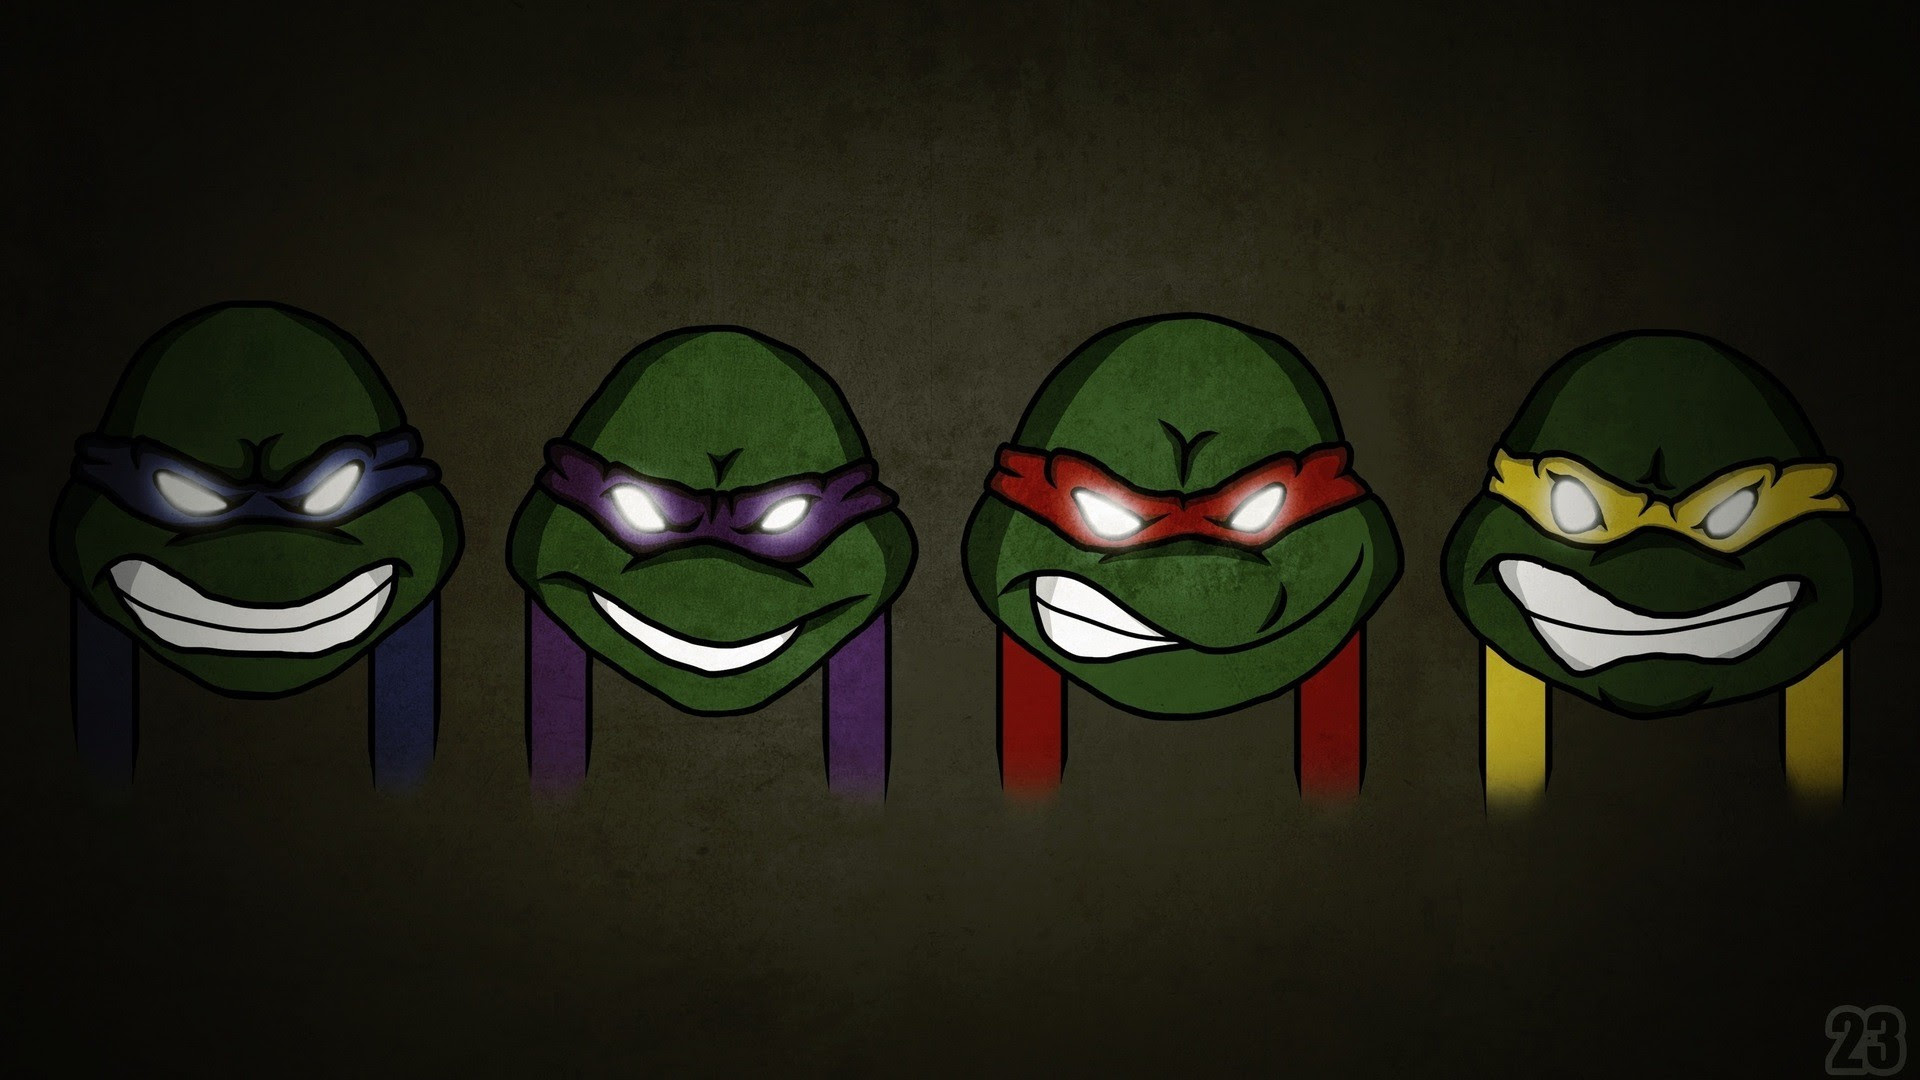 Ninja Turtles Wallpaper 72 Images